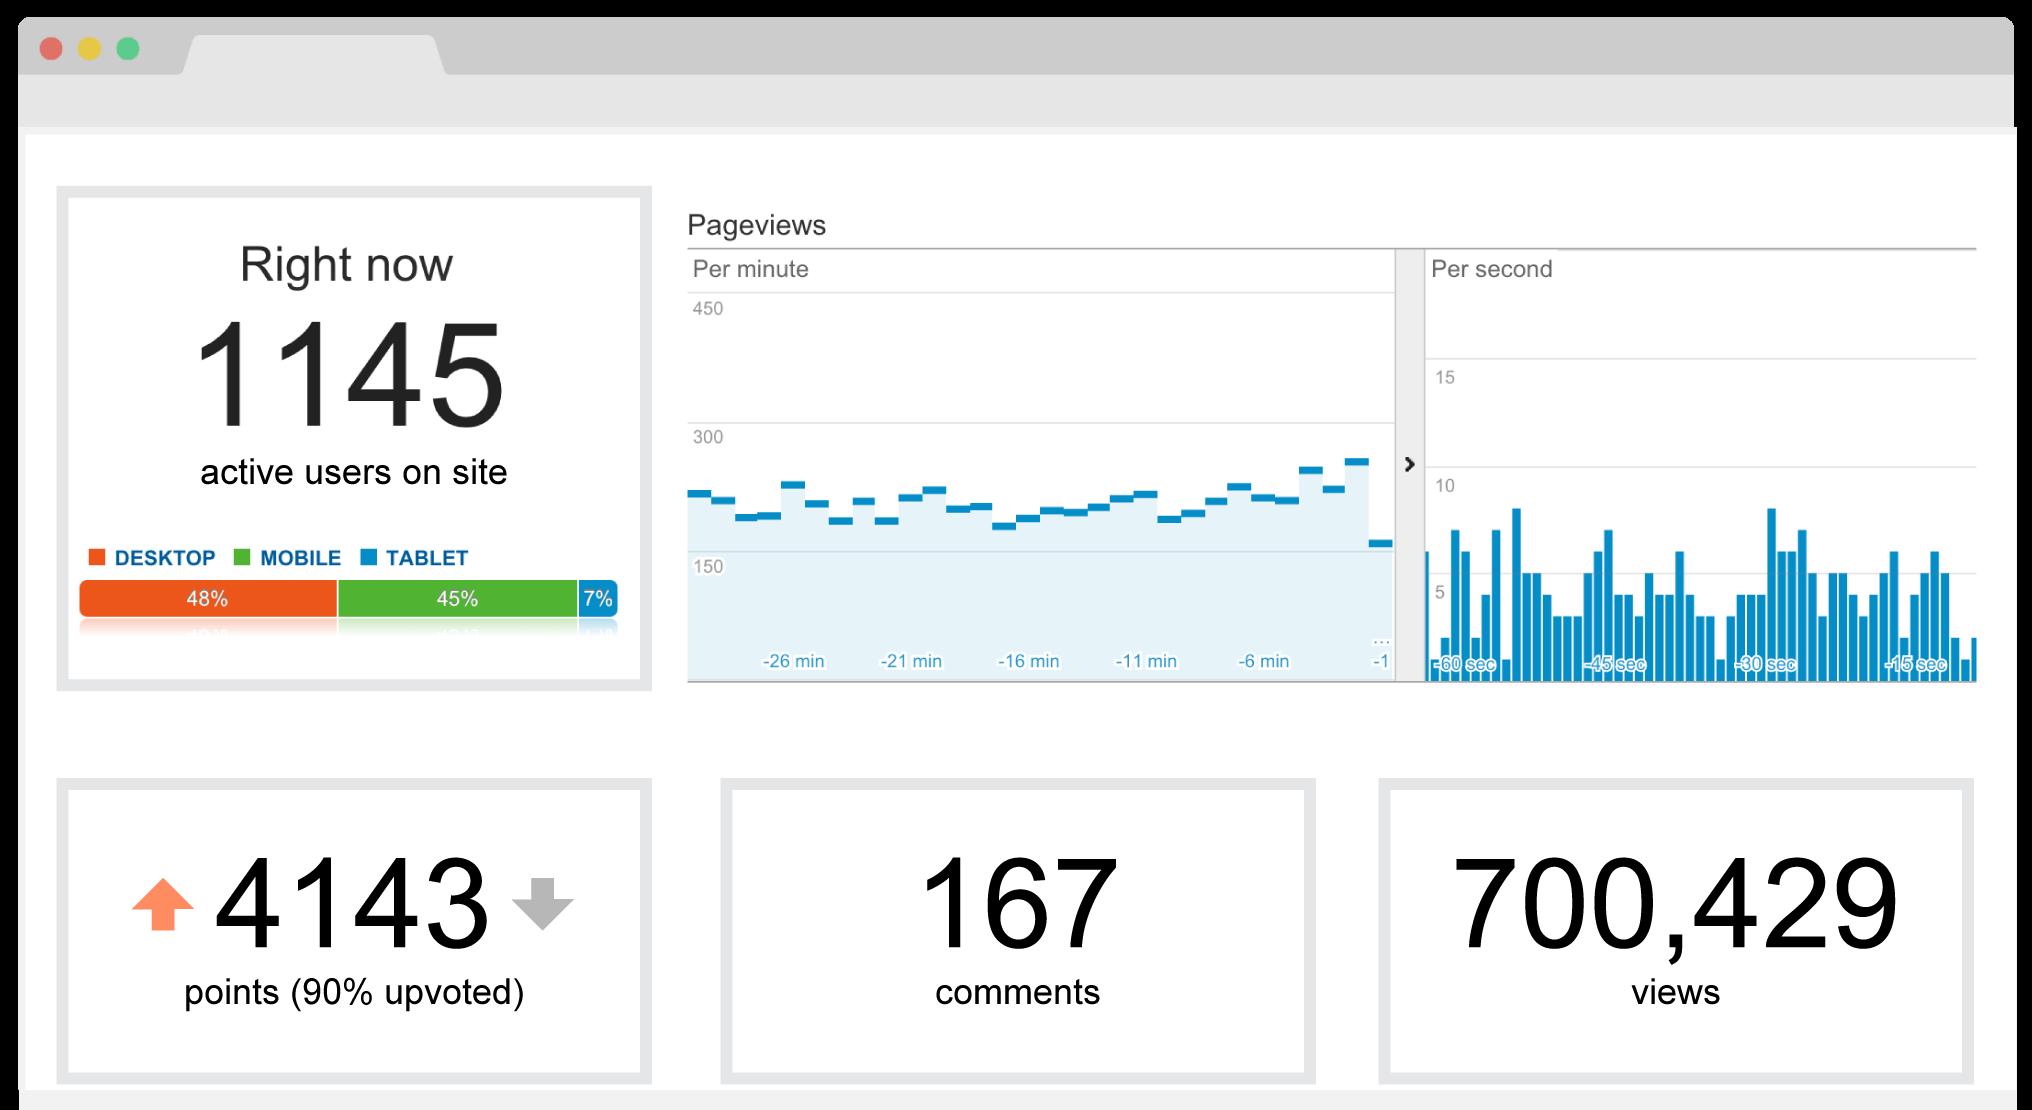 viral-traffic-reddit-imgur-front-page-stats-breakdown